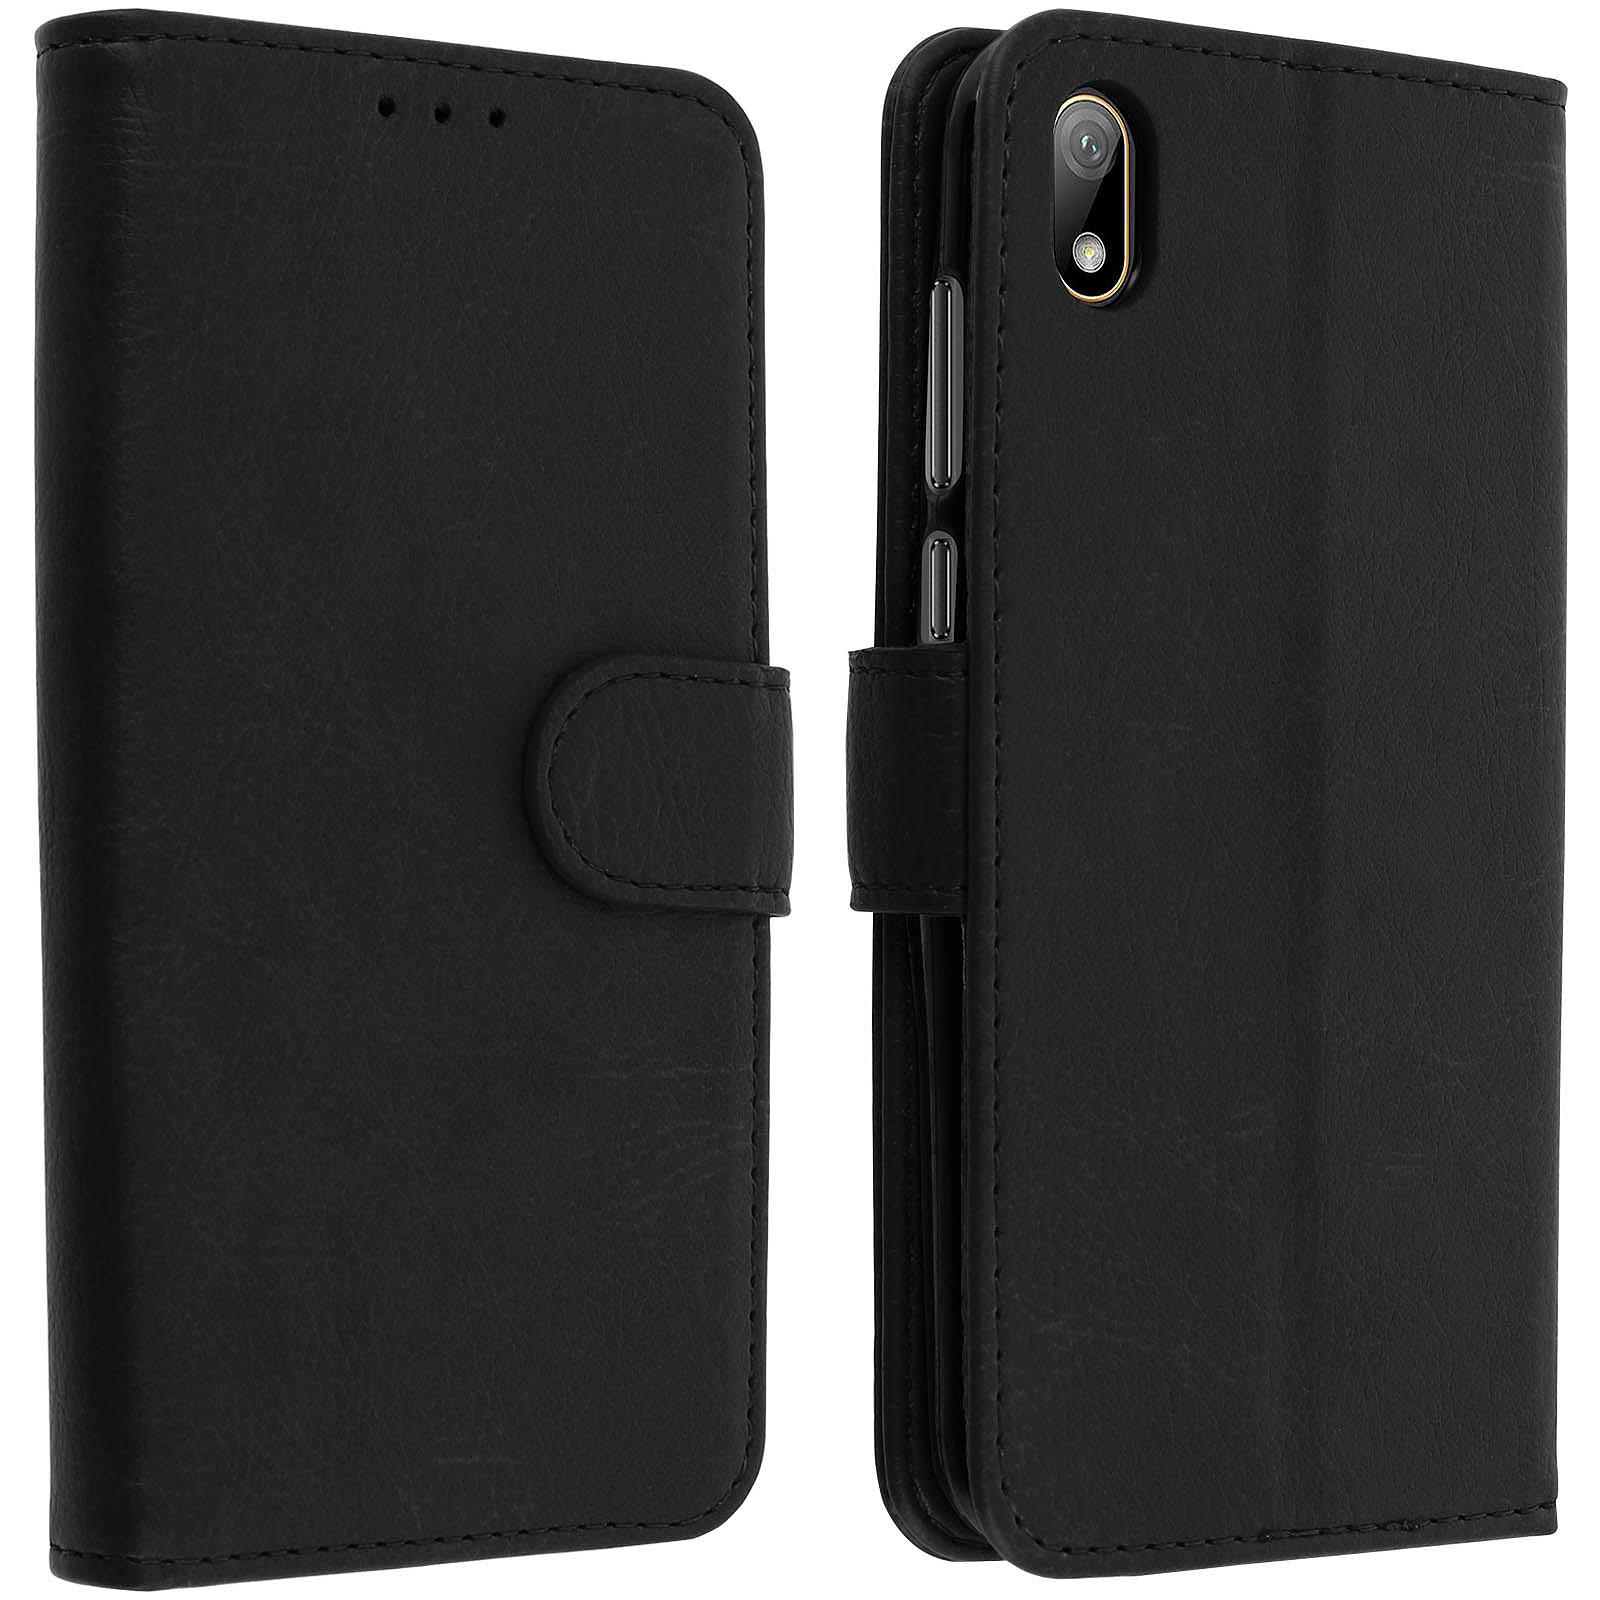 Avizar Etui folio Noir pour Huawei Y5 2019 , Honor 8S